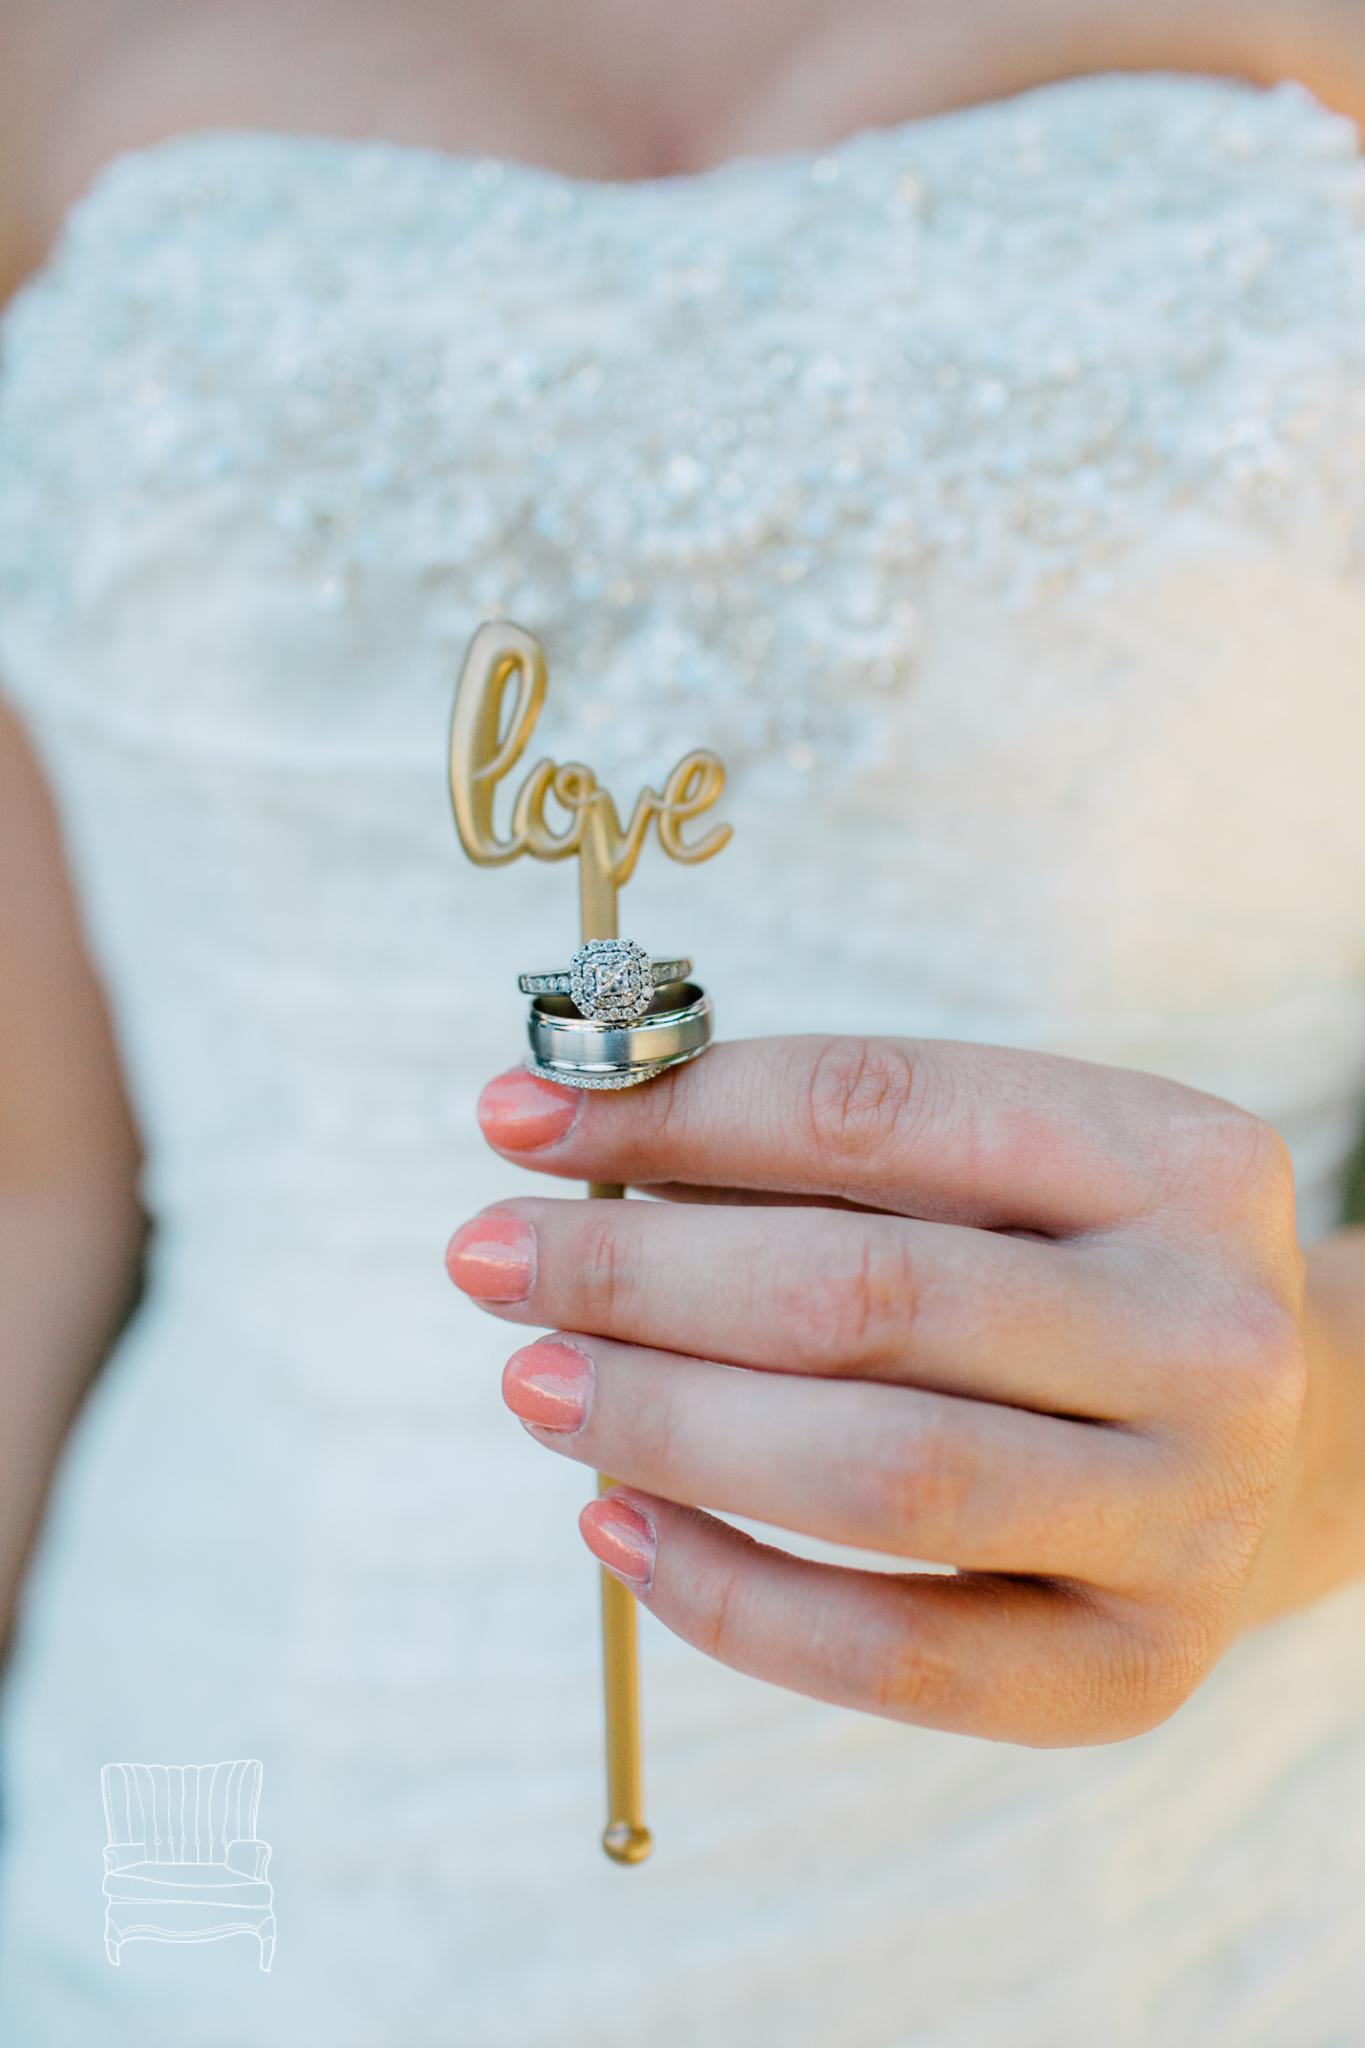 bellingham-washington-wedding-photographer-baker-creek-place-mollee-6.jpg